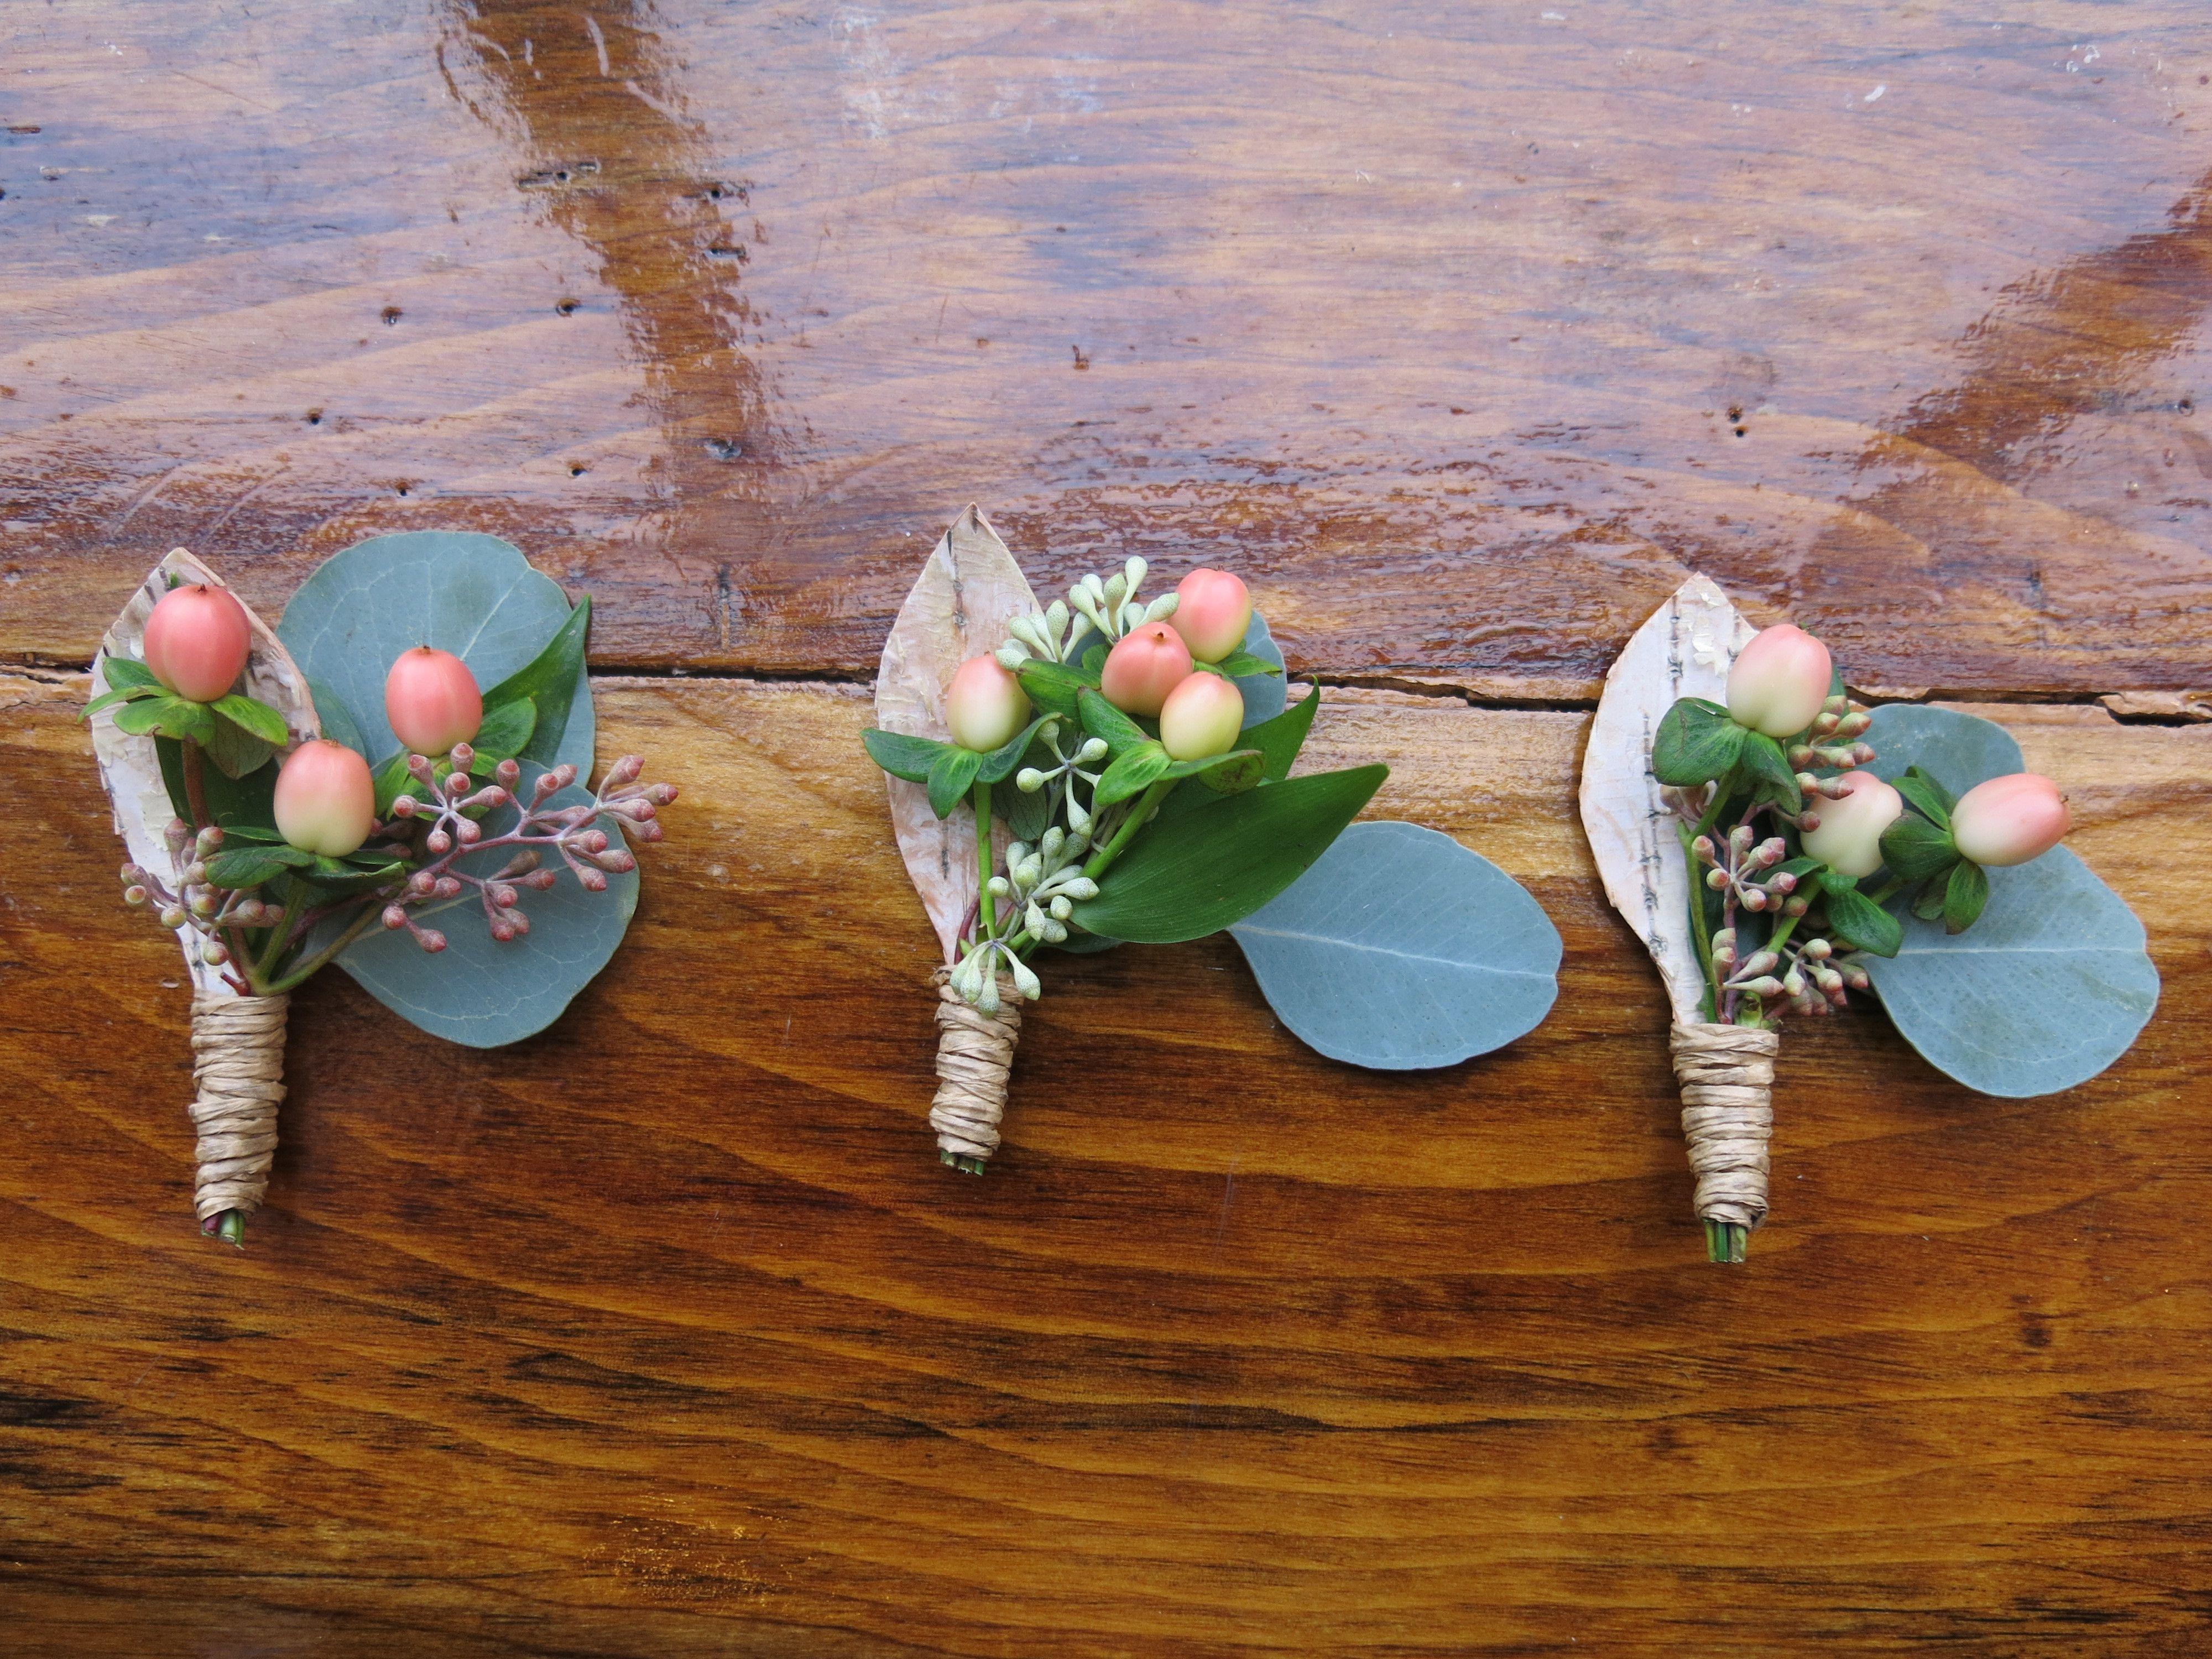 Bloomnation send flowers sameday flower arrangement